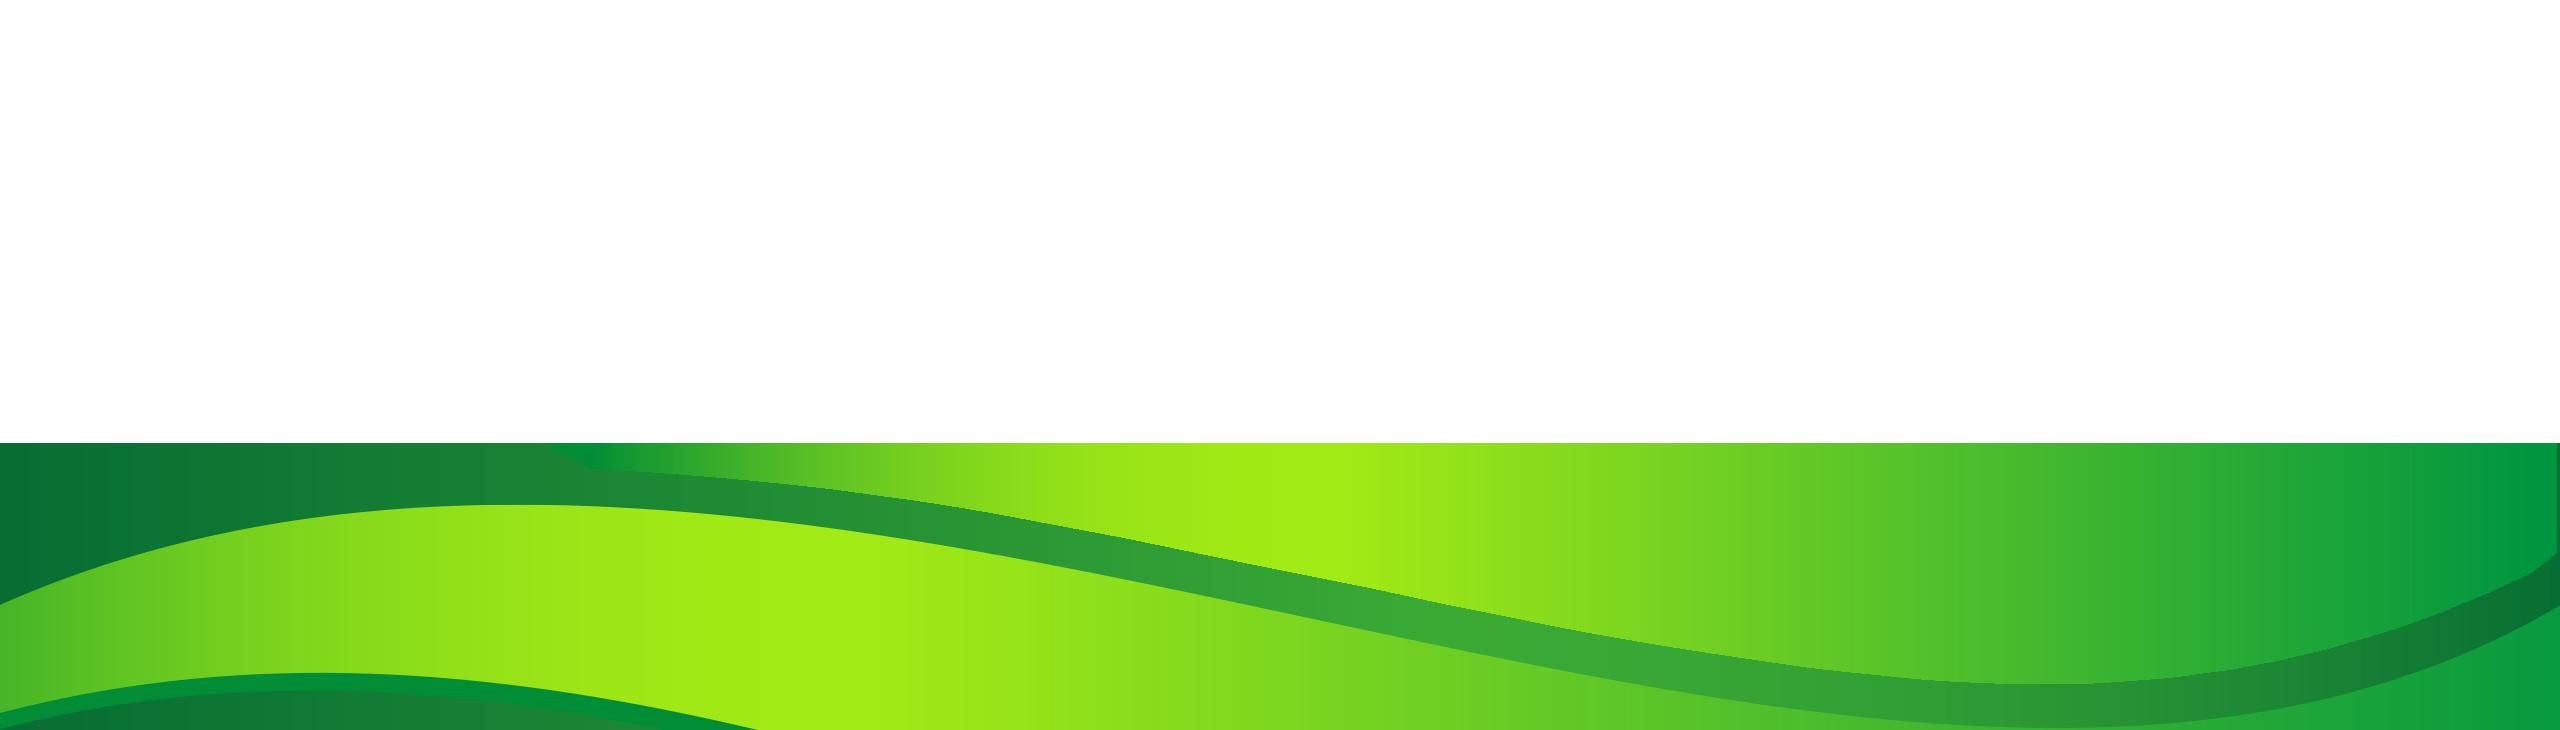 Clipart wave yellow. Green desktop wallpaper clip